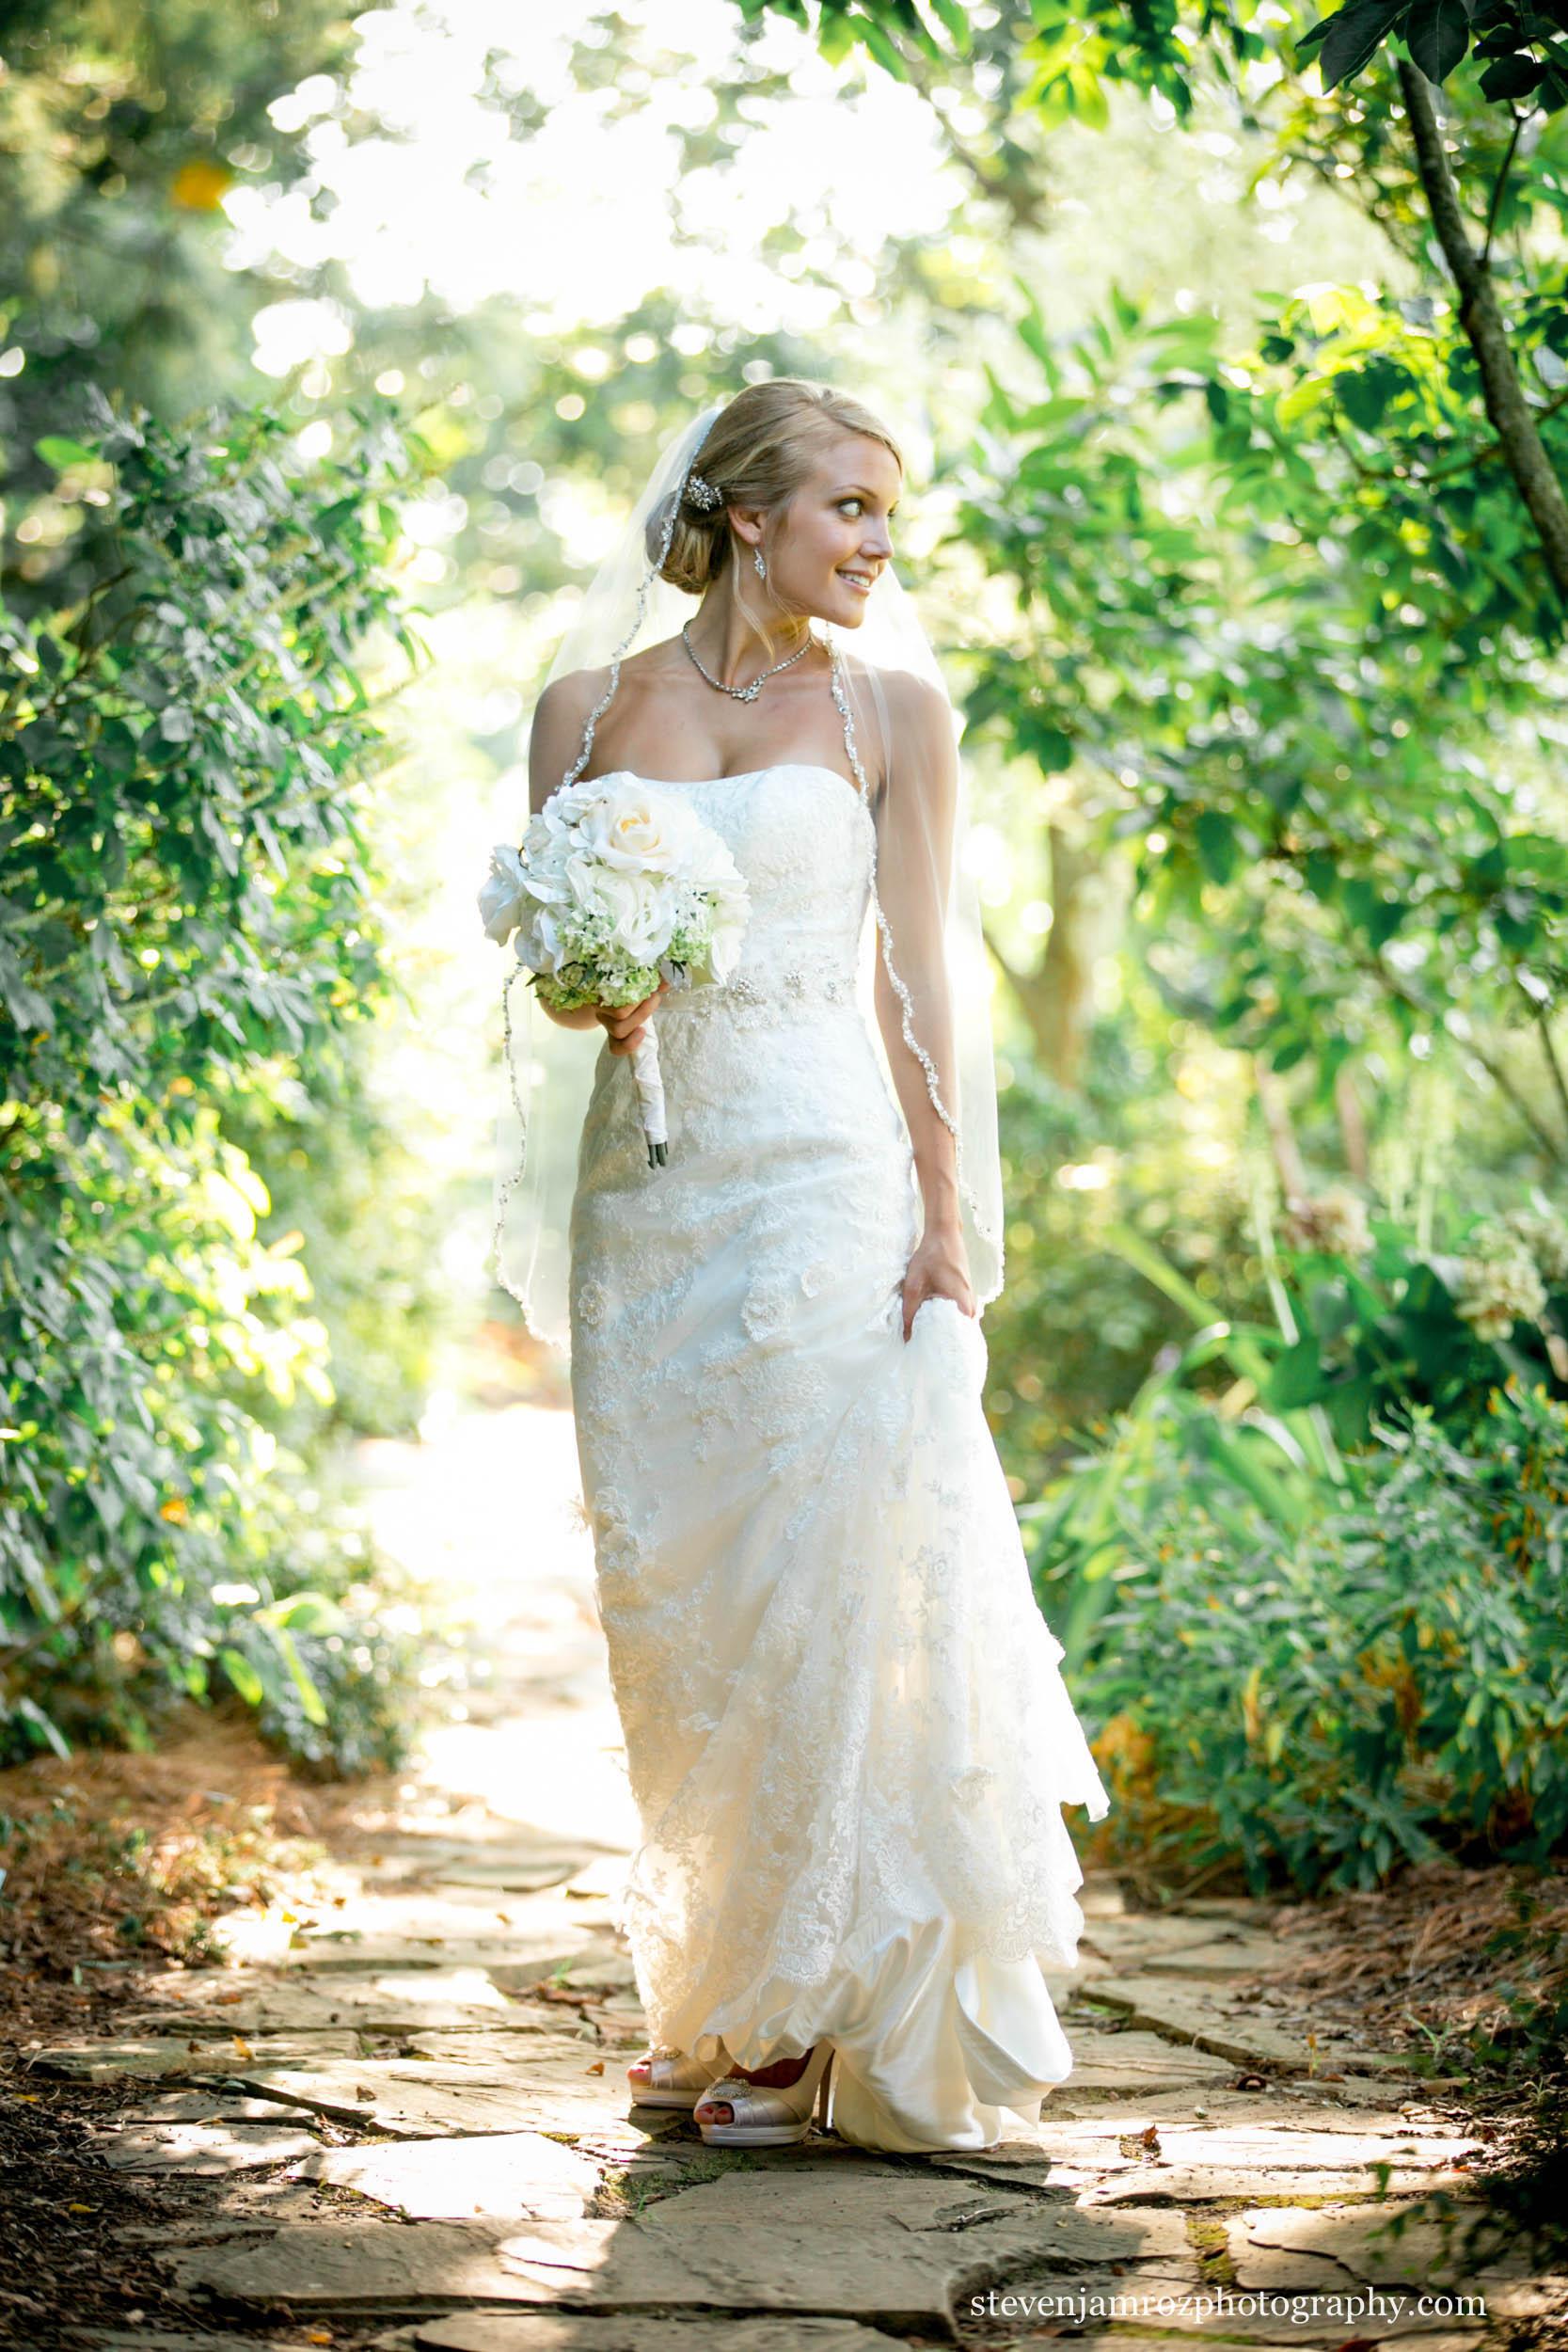 jc--raulston-bridal-portrait-pretty-bride-photographer-0945.jpg